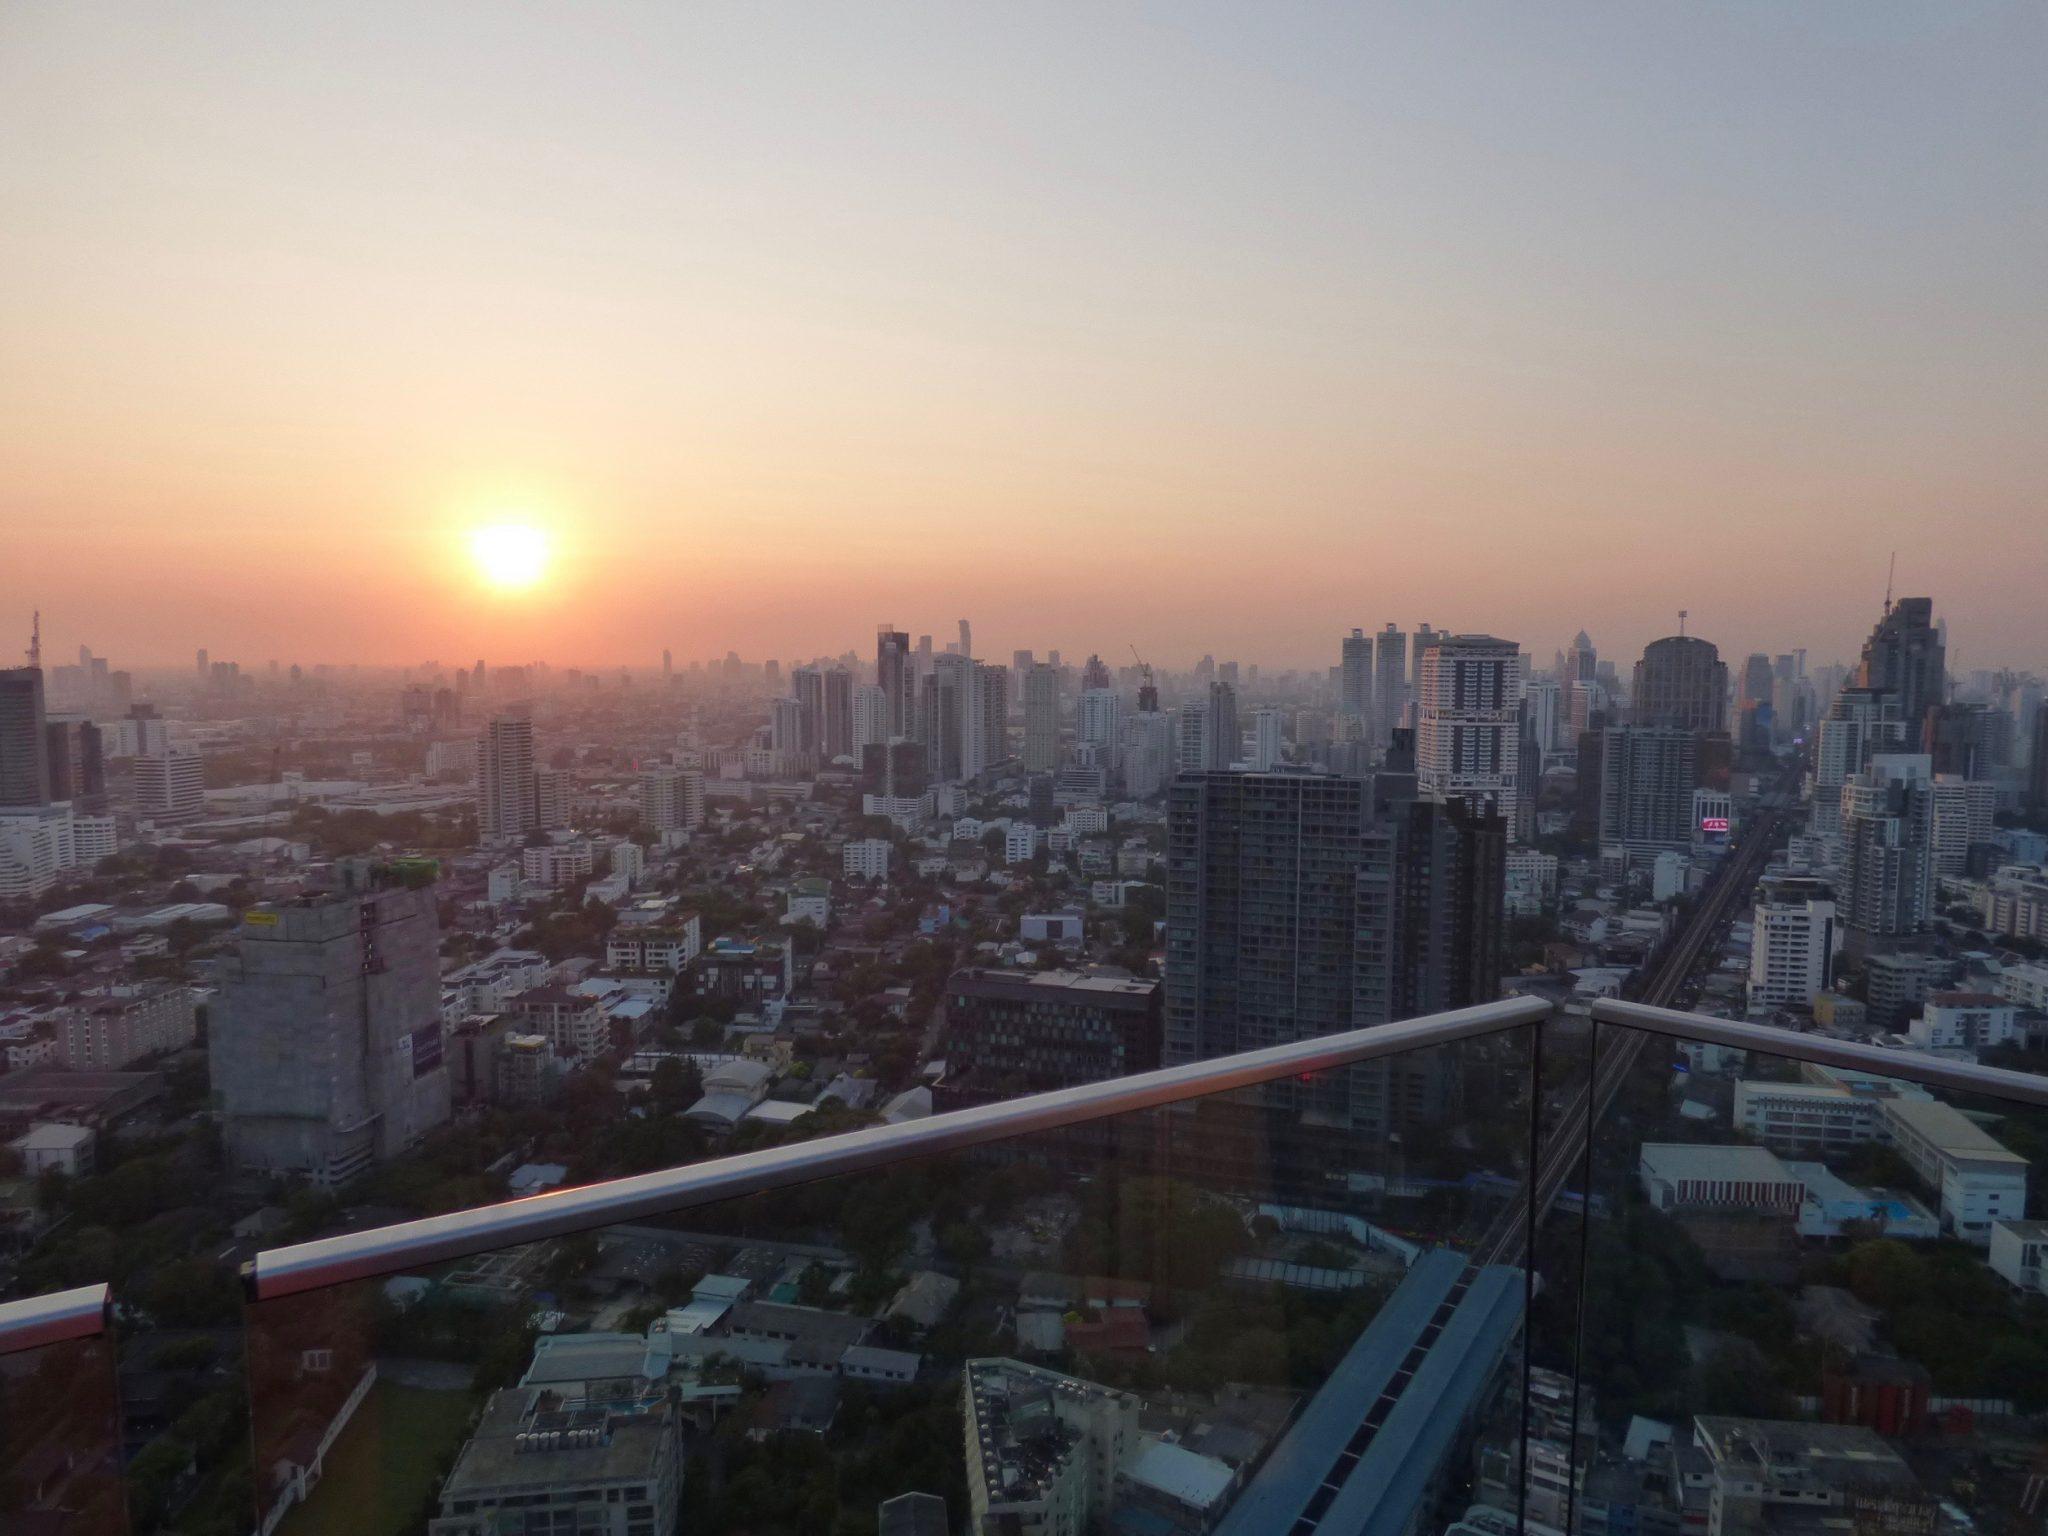 Octave kattobaari Bangkok